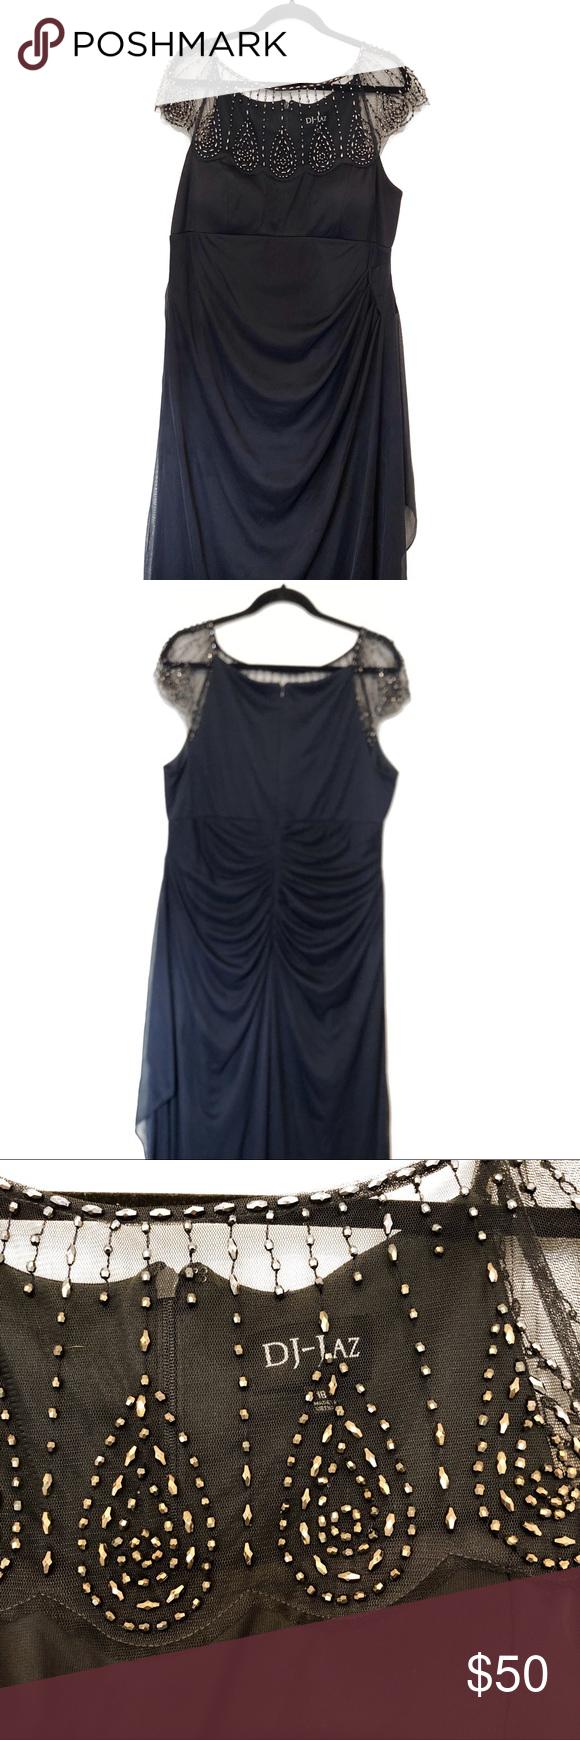 Dj Jaz Black Dress Size 18 Black Dress Size 18 Size 18 Dress Black Mesh Dress [ 1740 x 580 Pixel ]